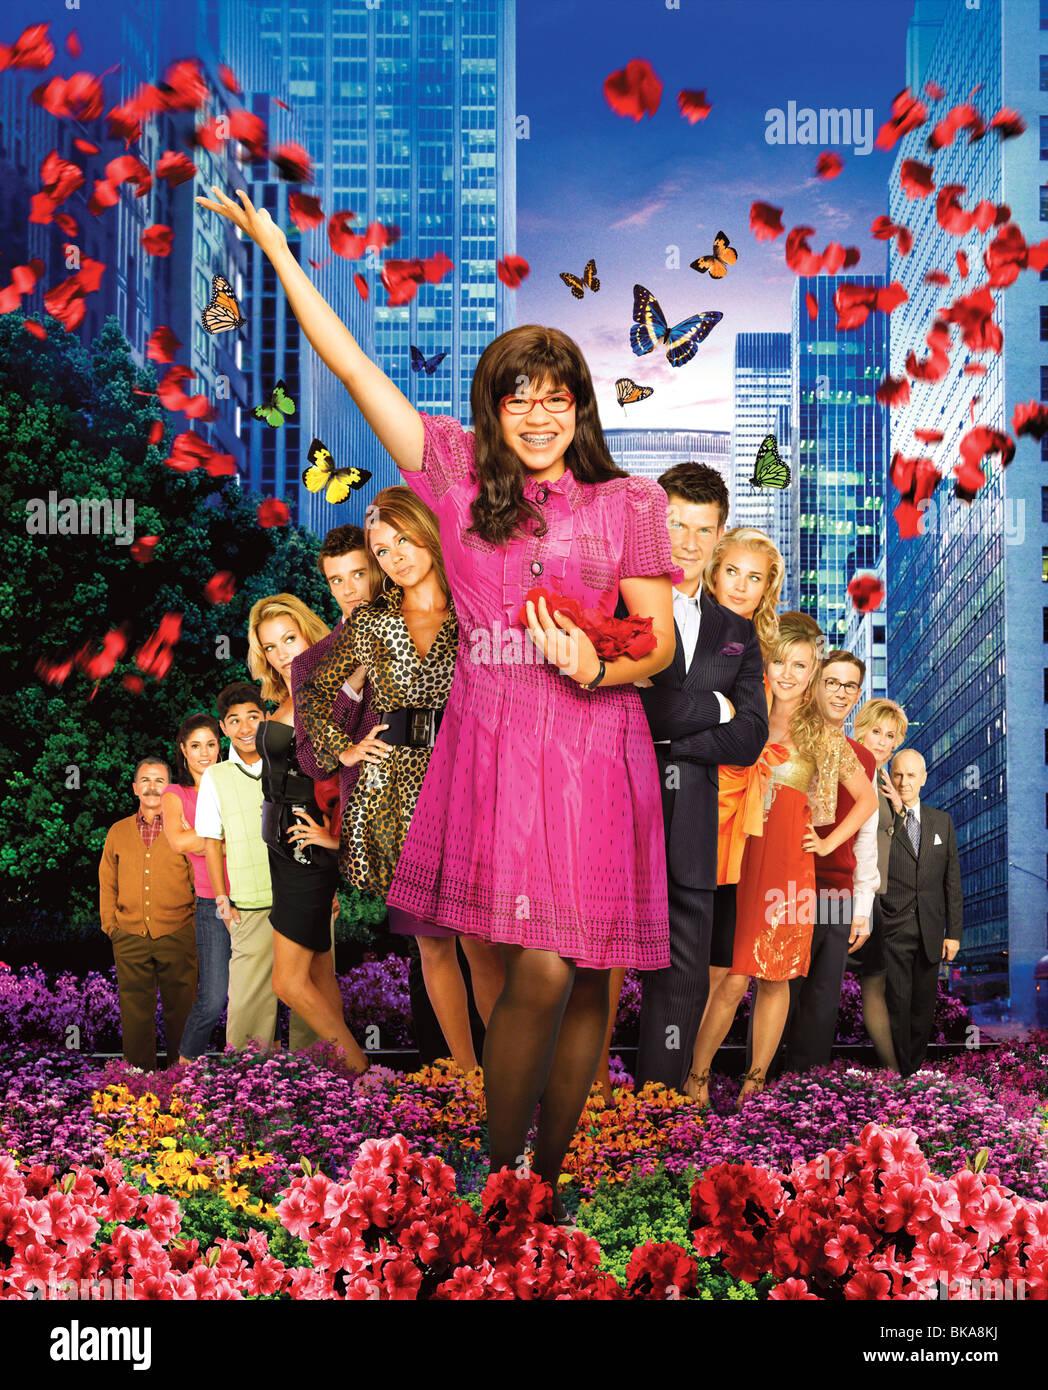 Ugly Betty TV Series 2006 -???? - USA America Ferrera - Stock Image